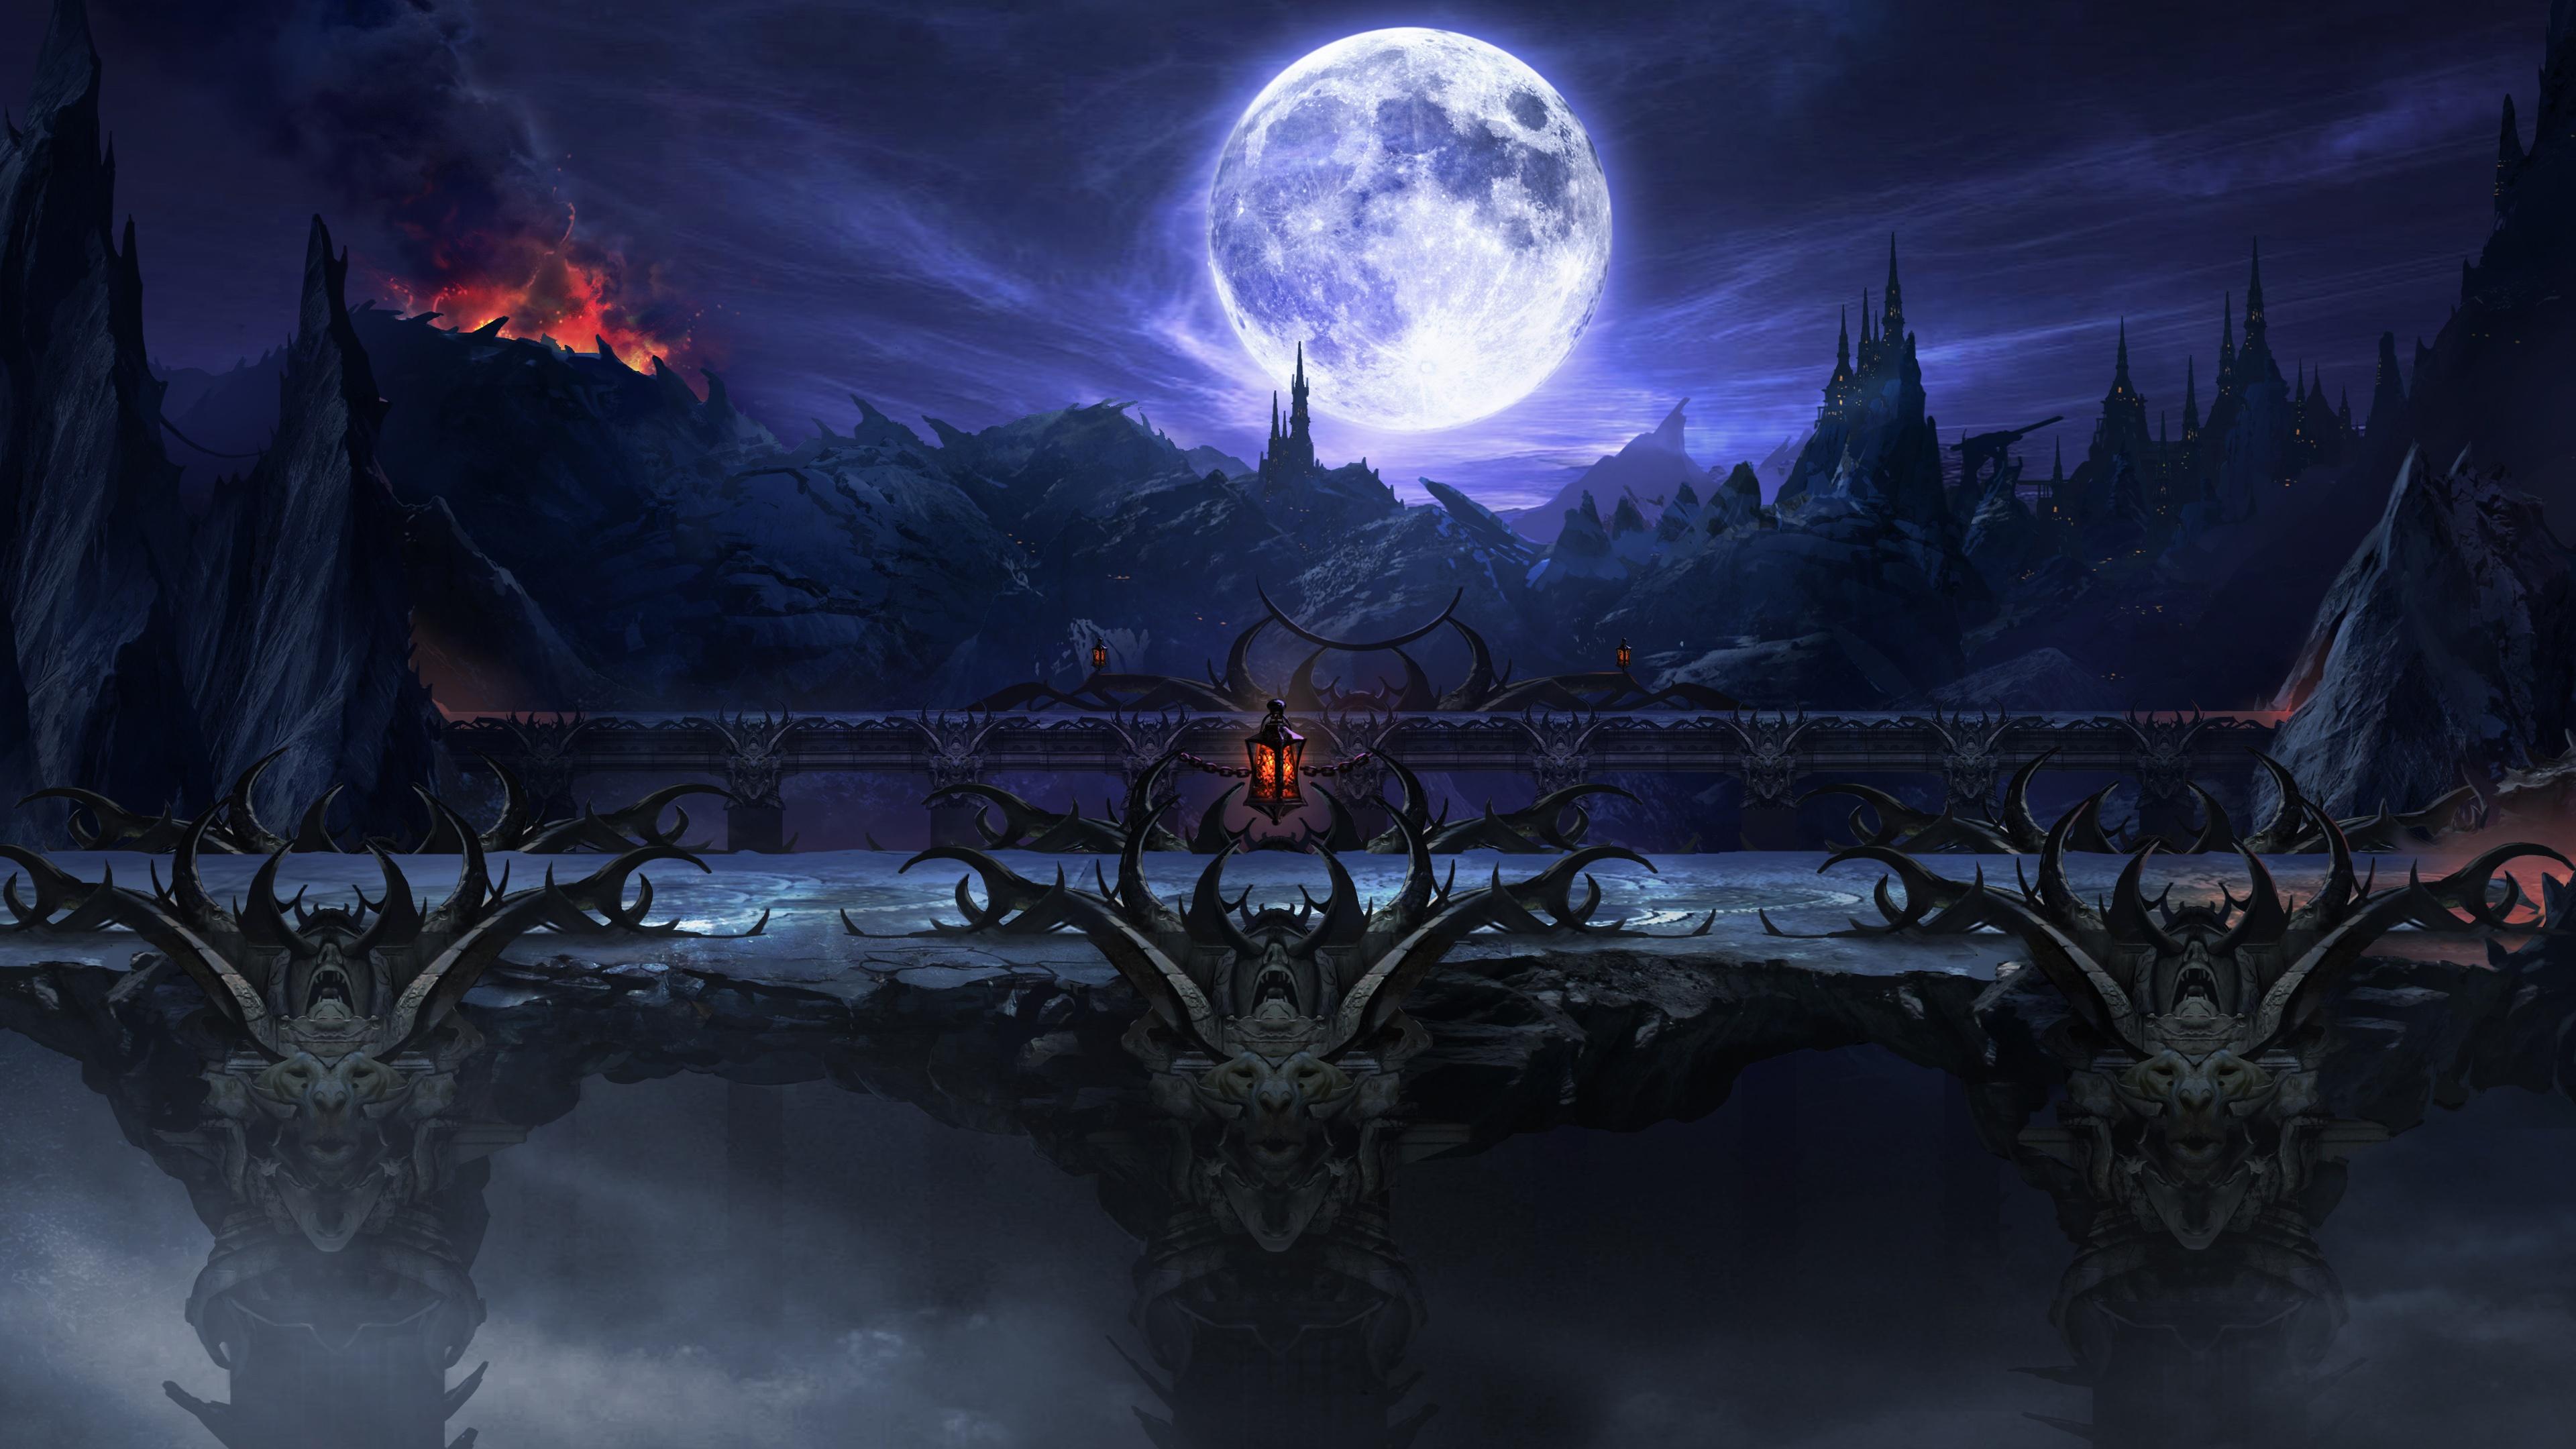 Train Travel Fantasy 4k Hd Desktop Wallpaper For Wide: Mortal Kombat X Wallpapers, Pictures, Images